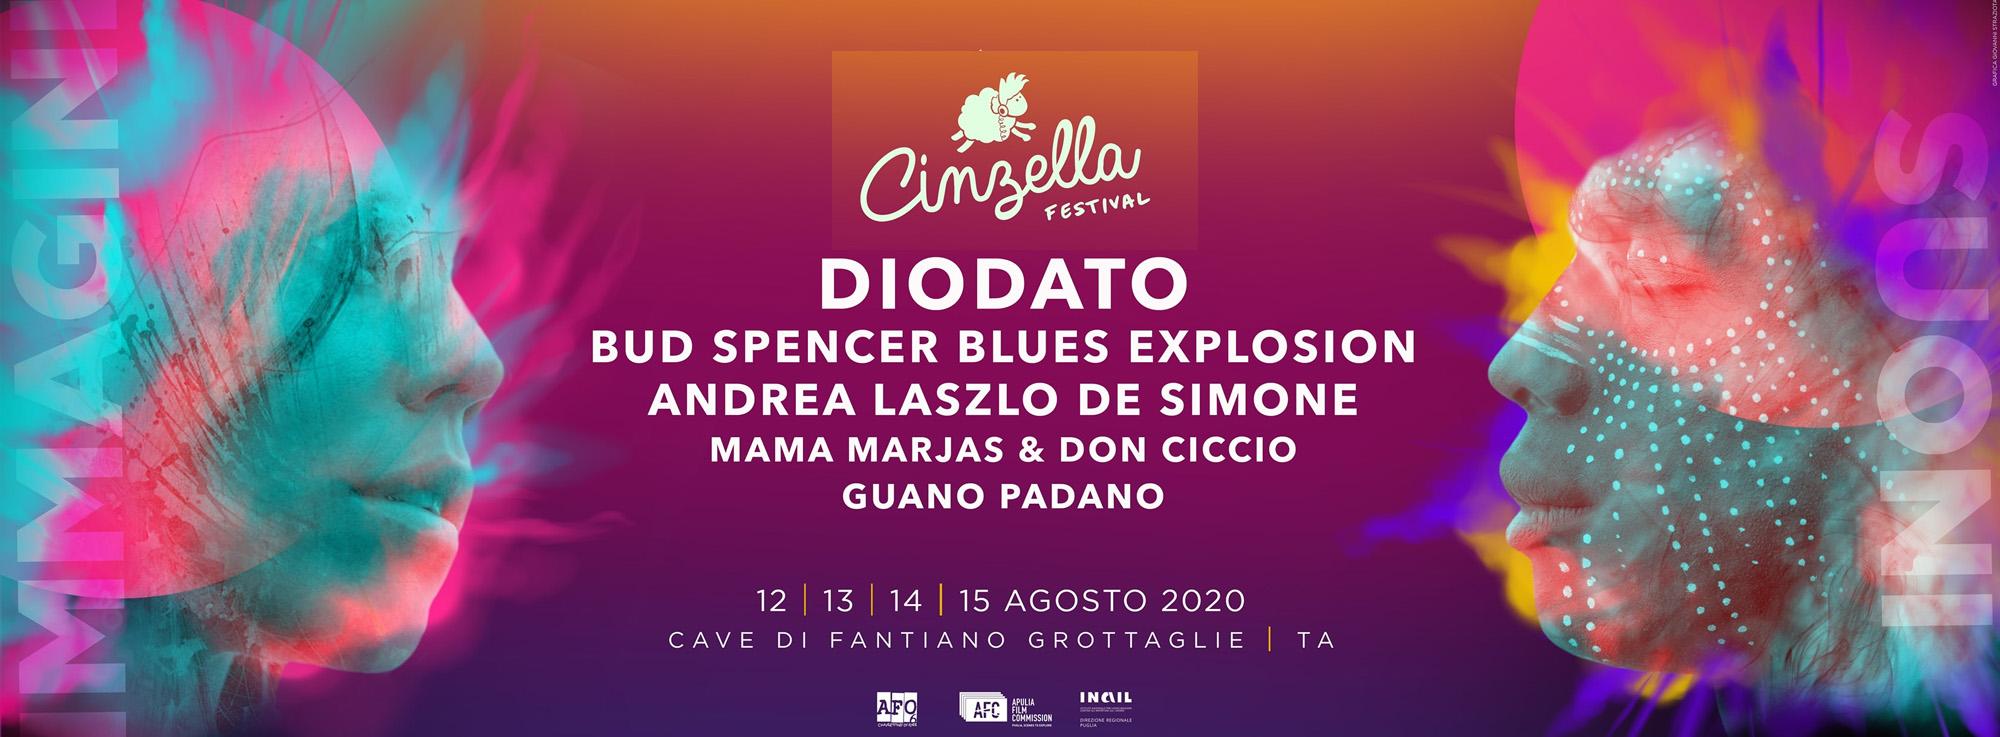 Grottaglie: Cinzella Festival